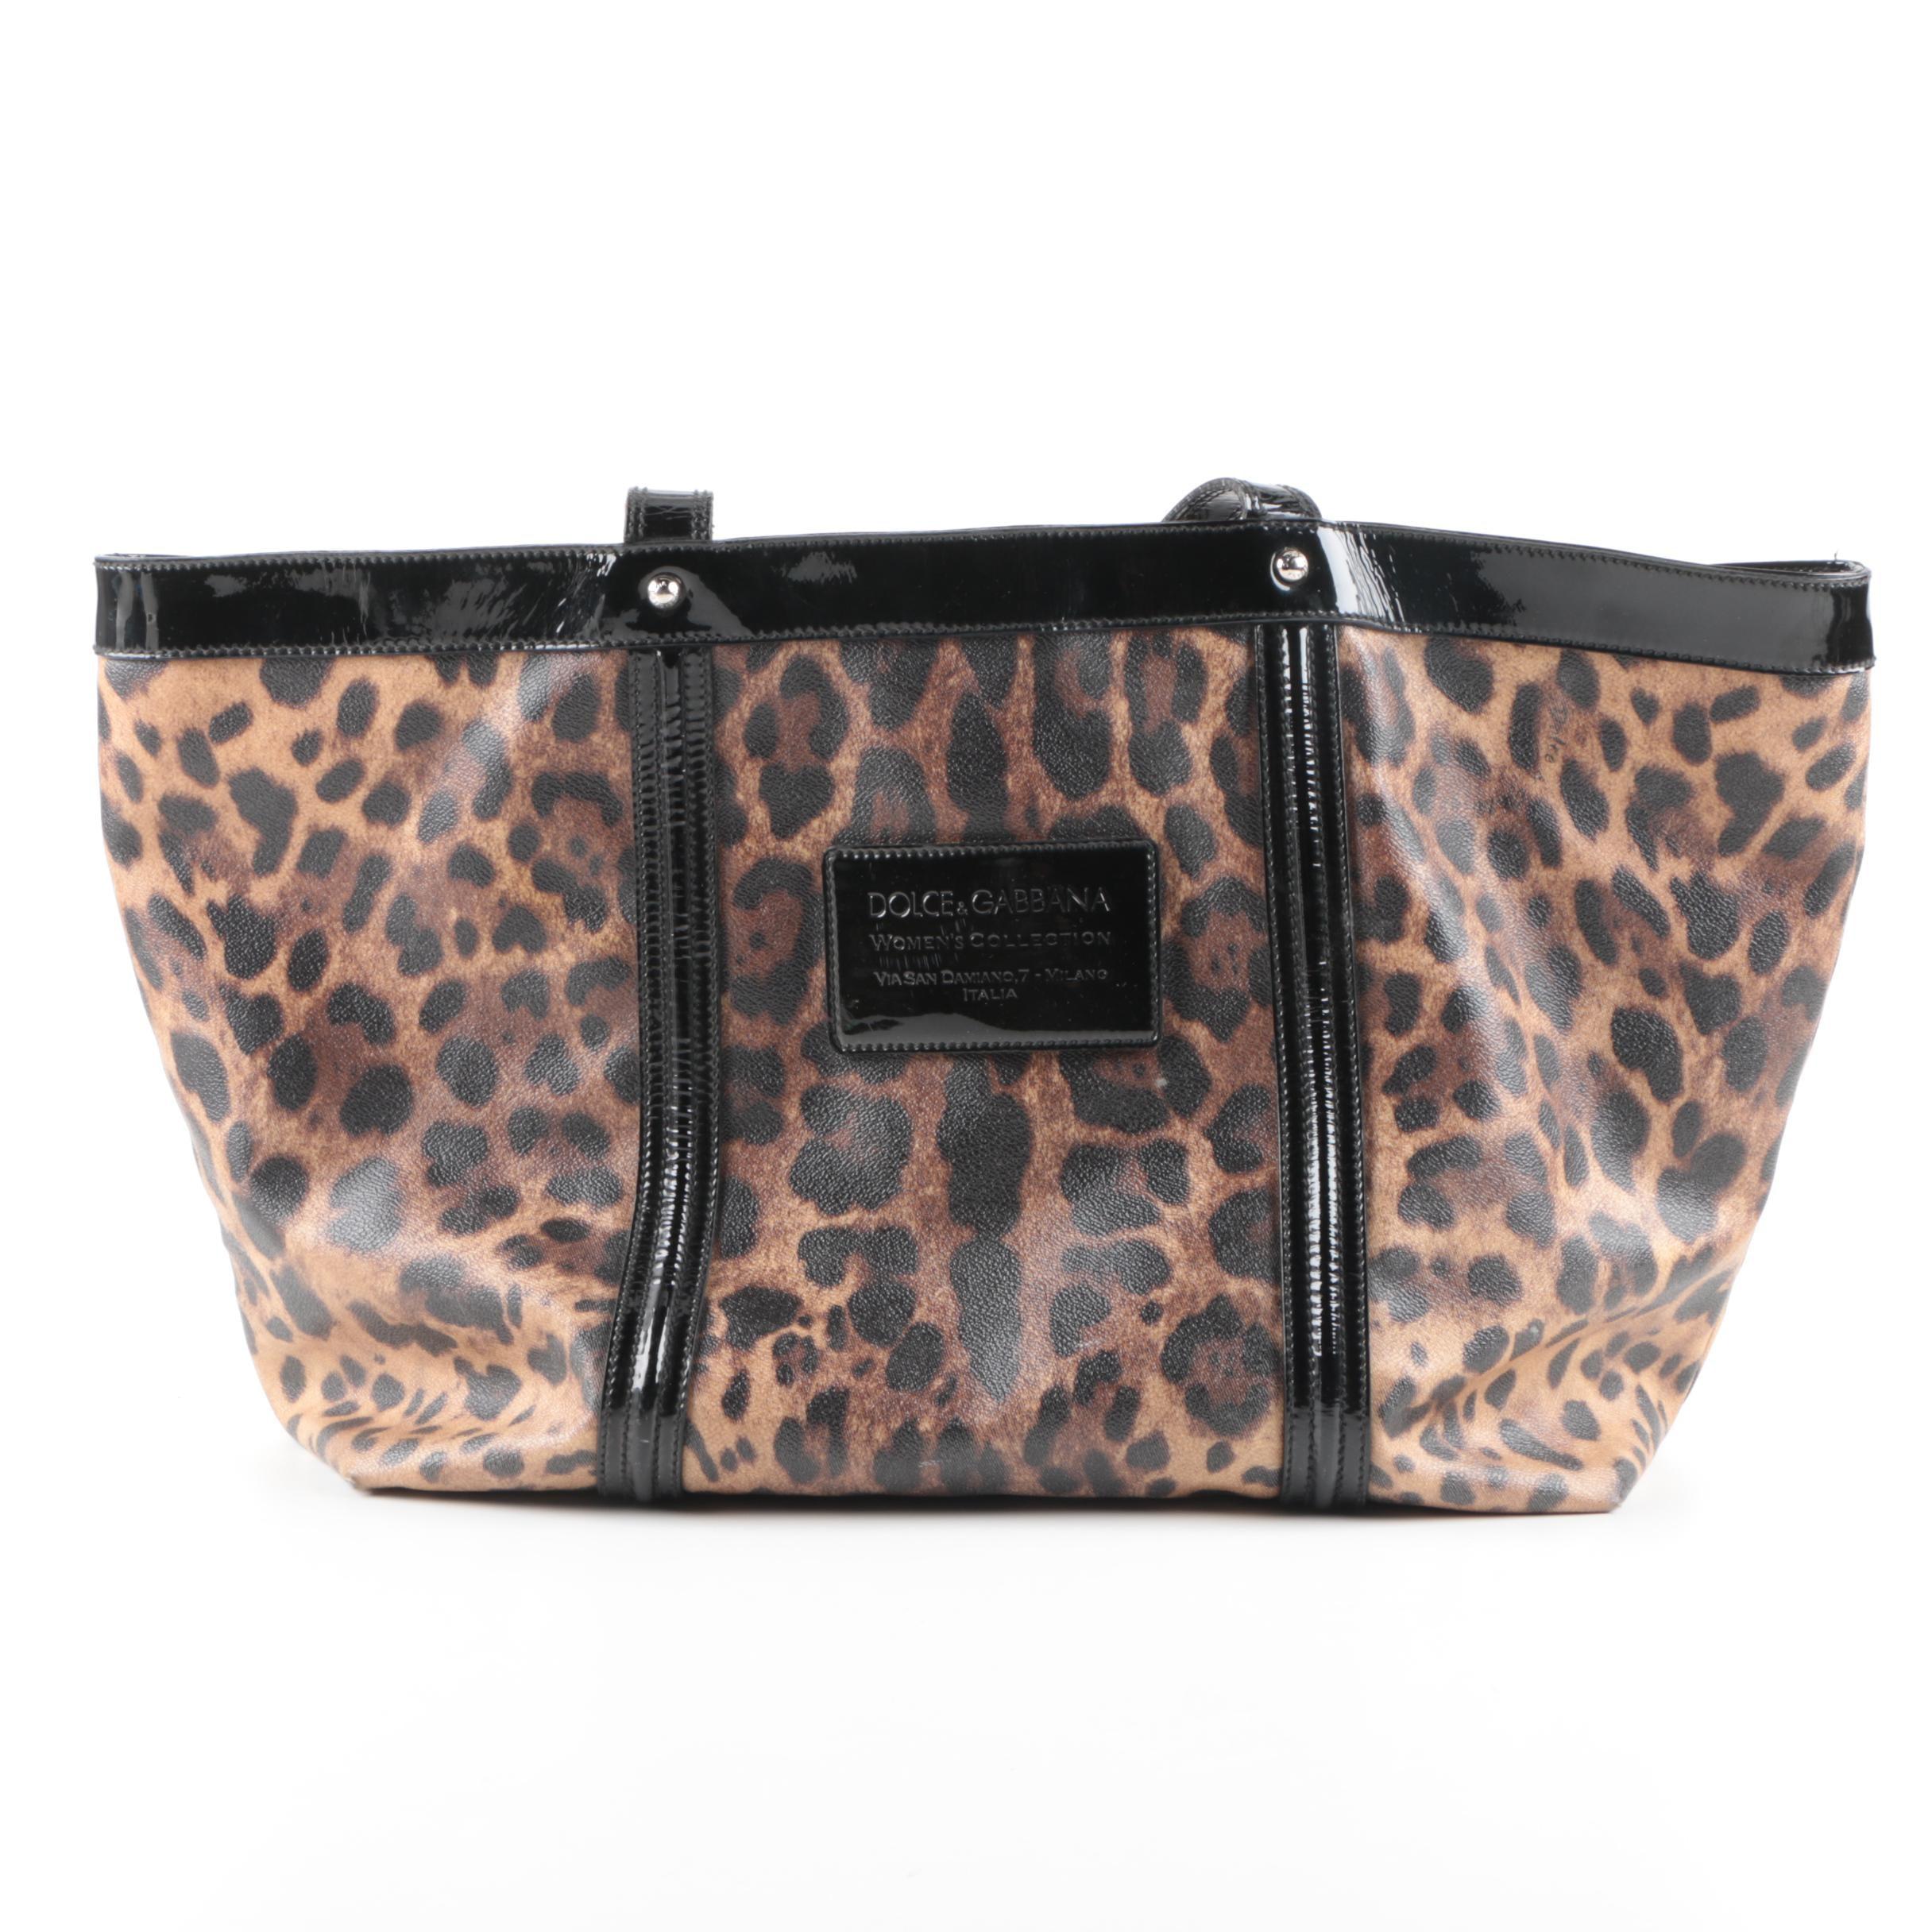 Dolce & Gabbana Miss Bye Bye Leopard Print Tote